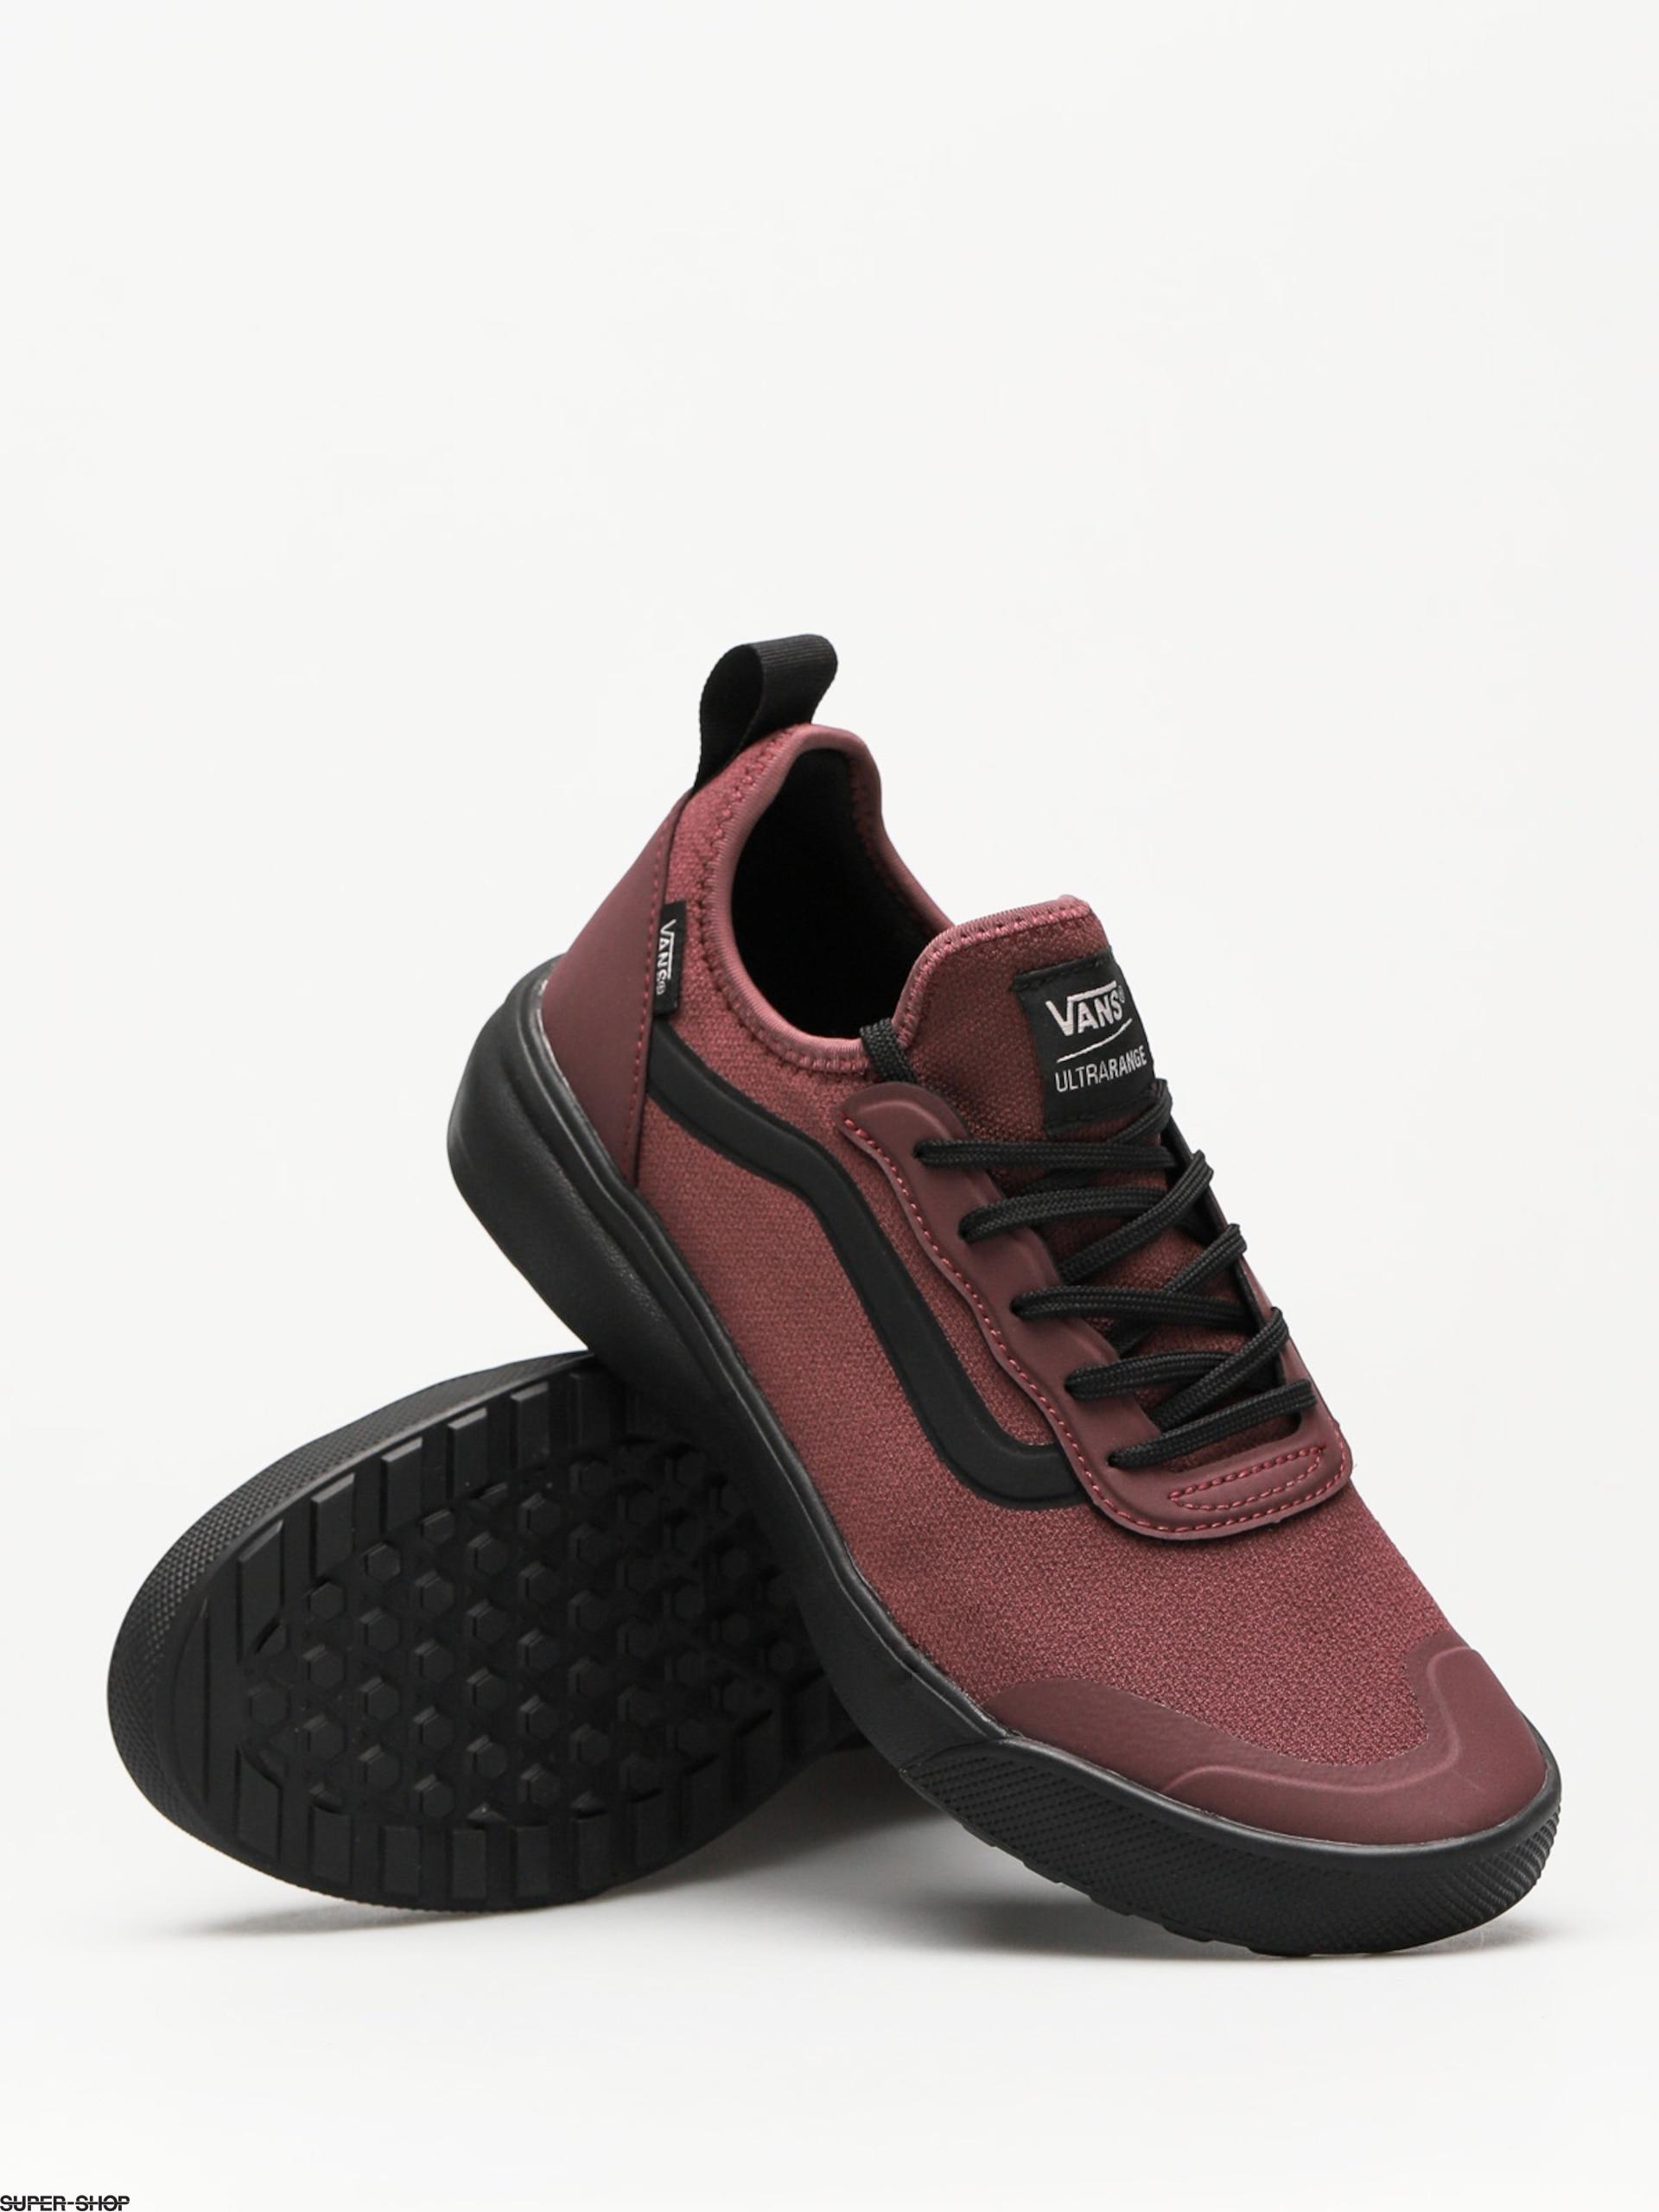 Vans Shoes Ultrarange Ac (catawba grape